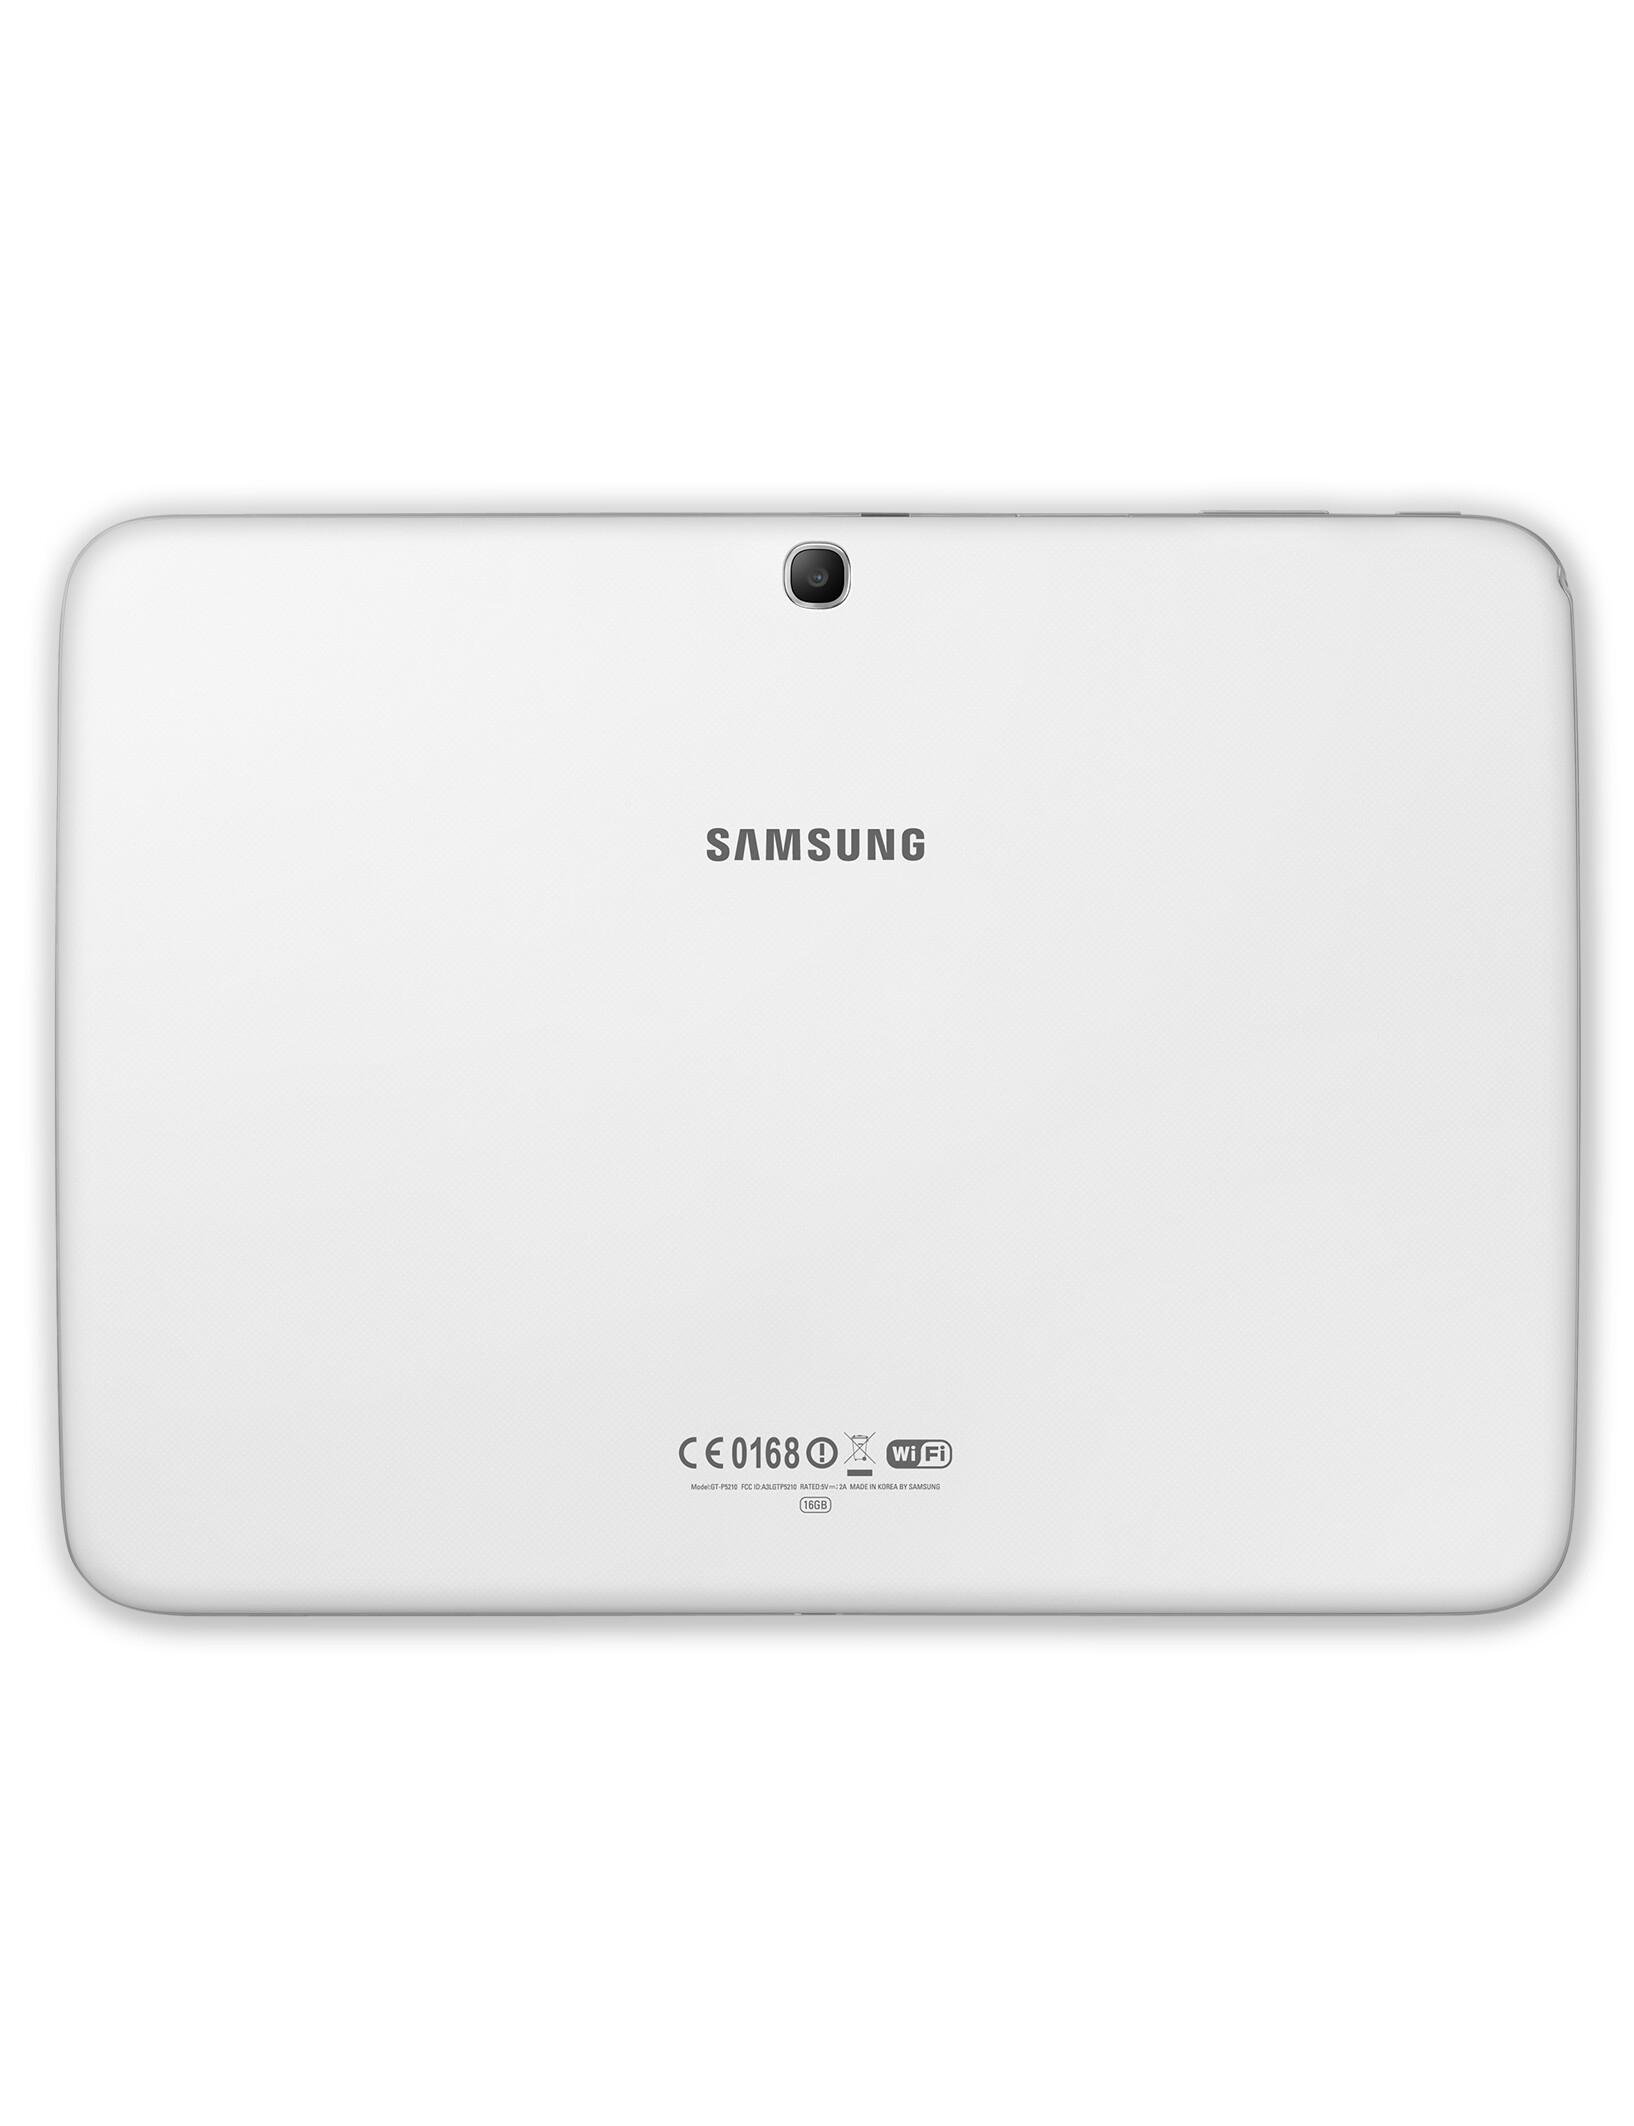 samsung galaxy tab 3 10 1 inch specs. Black Bedroom Furniture Sets. Home Design Ideas